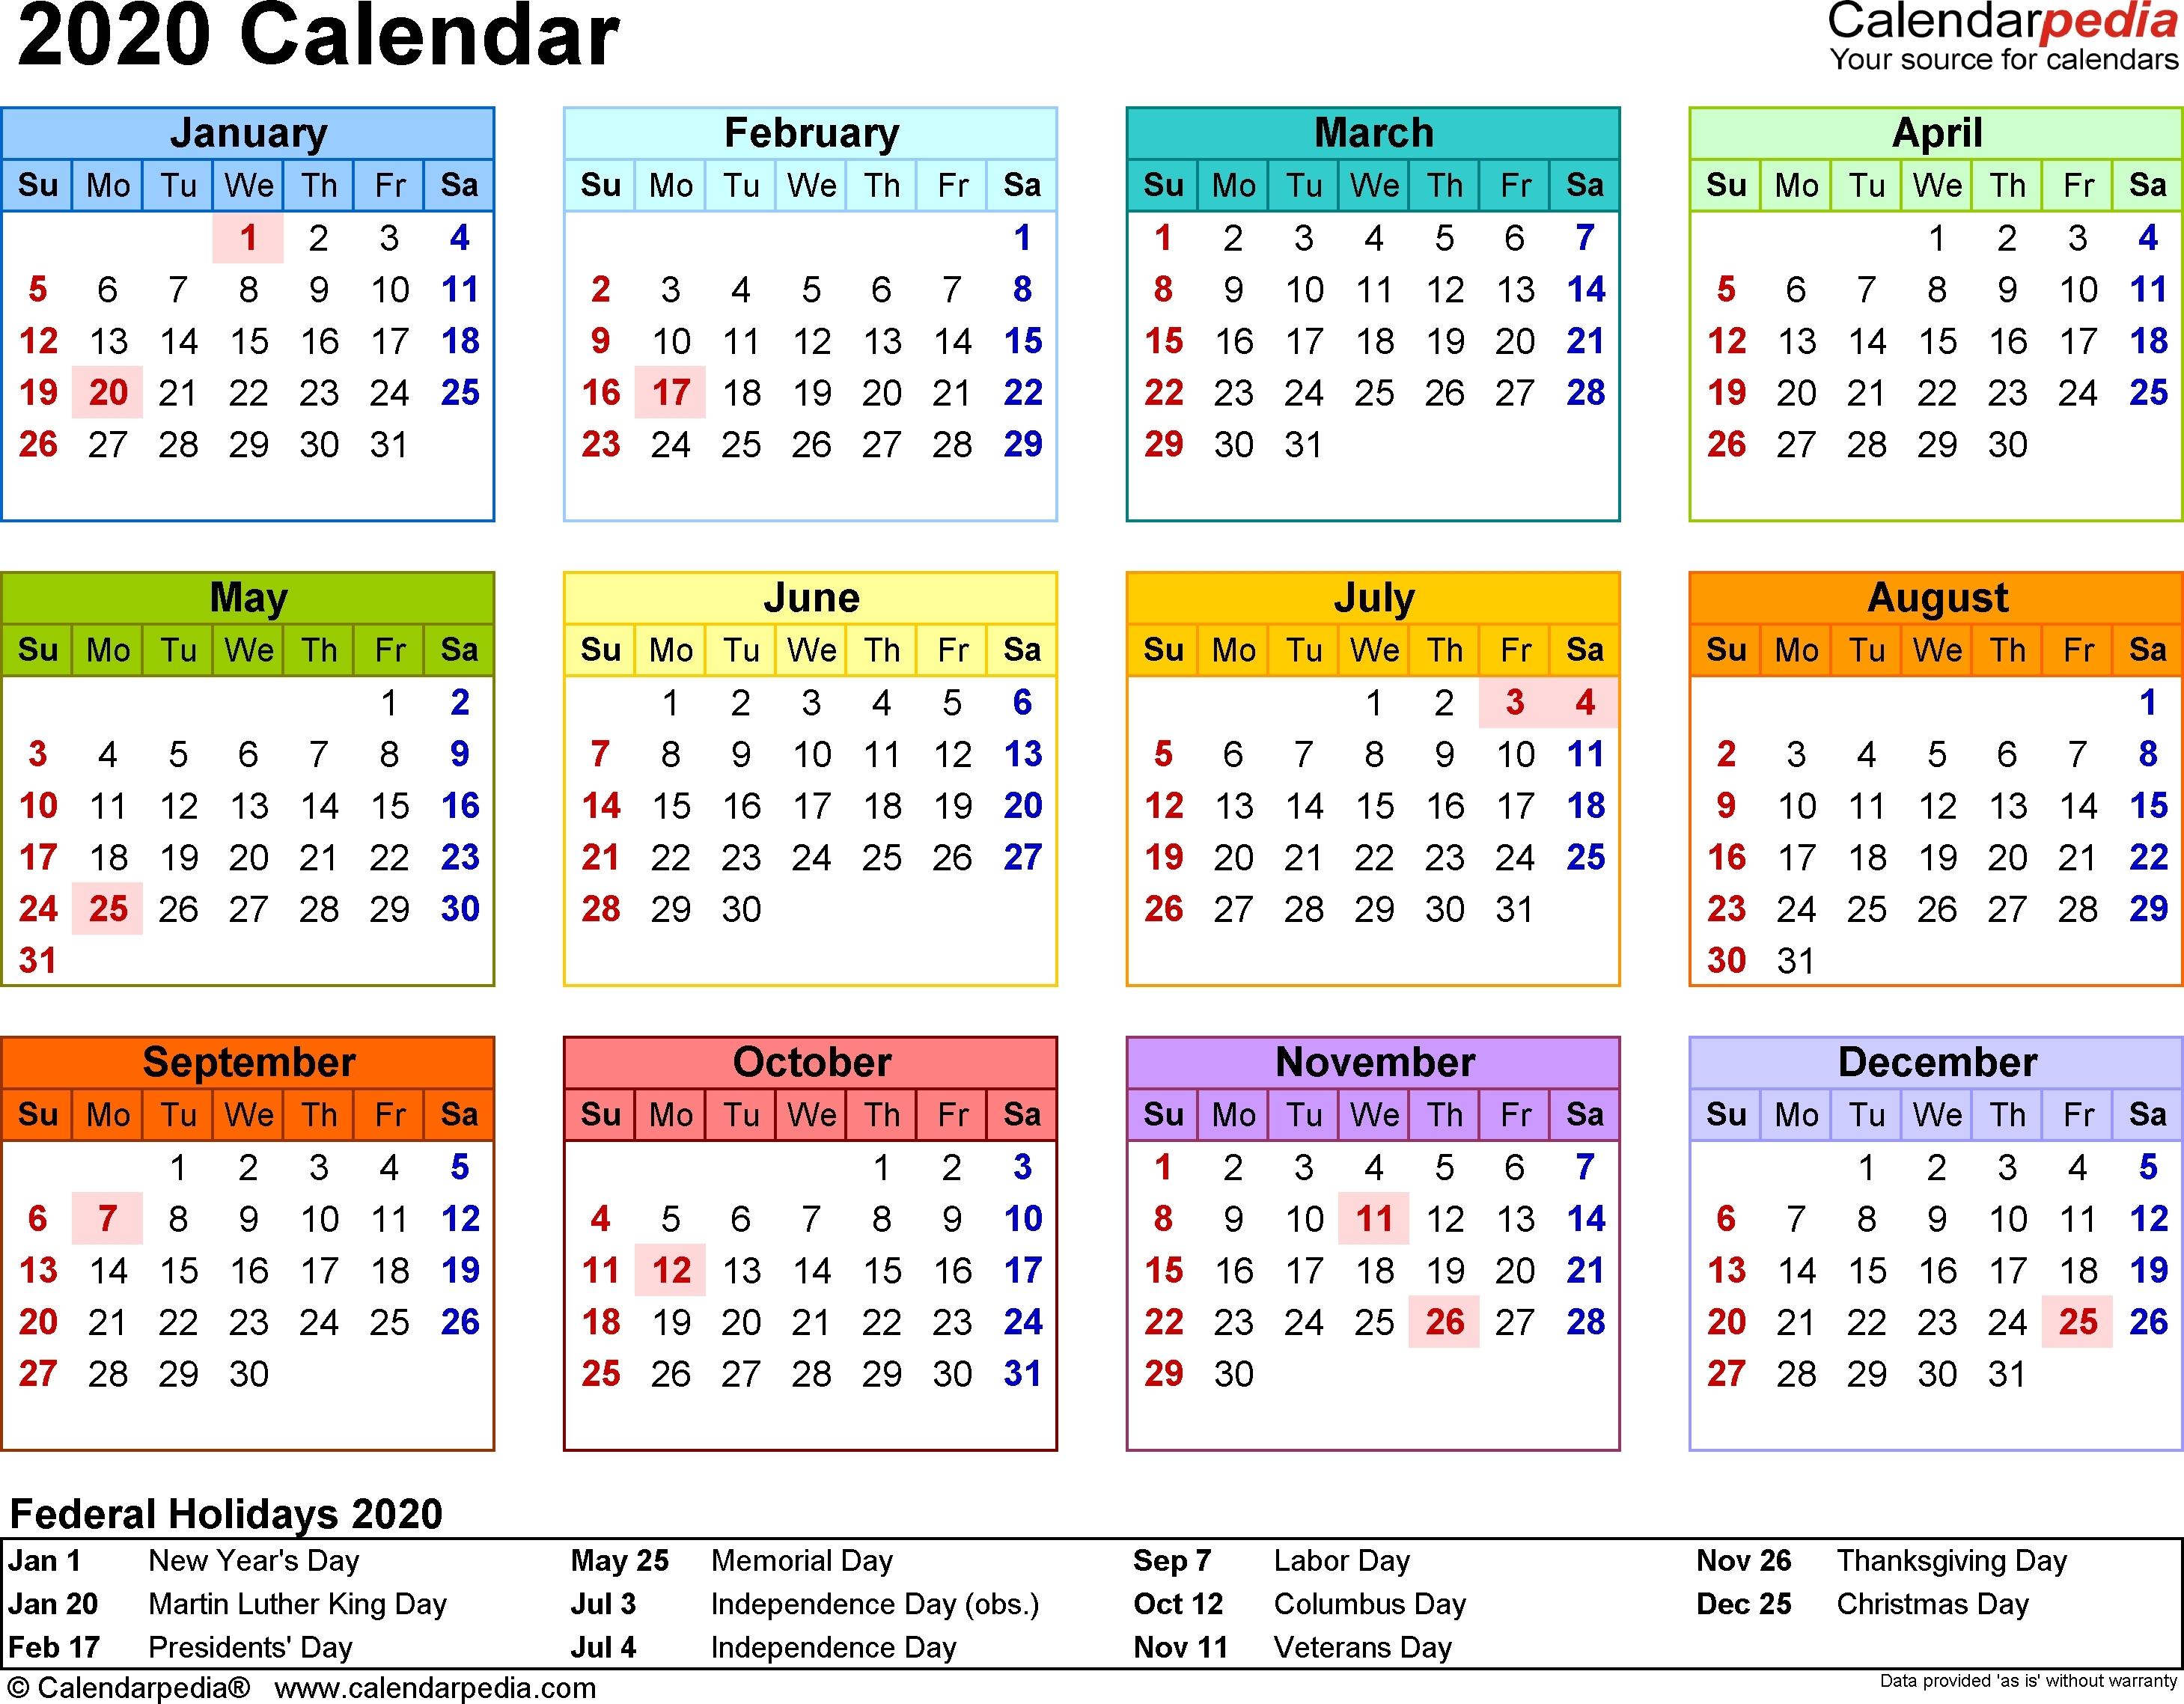 School Calendar 2020 South Africa | Calendar Design Ideas_School Calendar In South Africa 2020